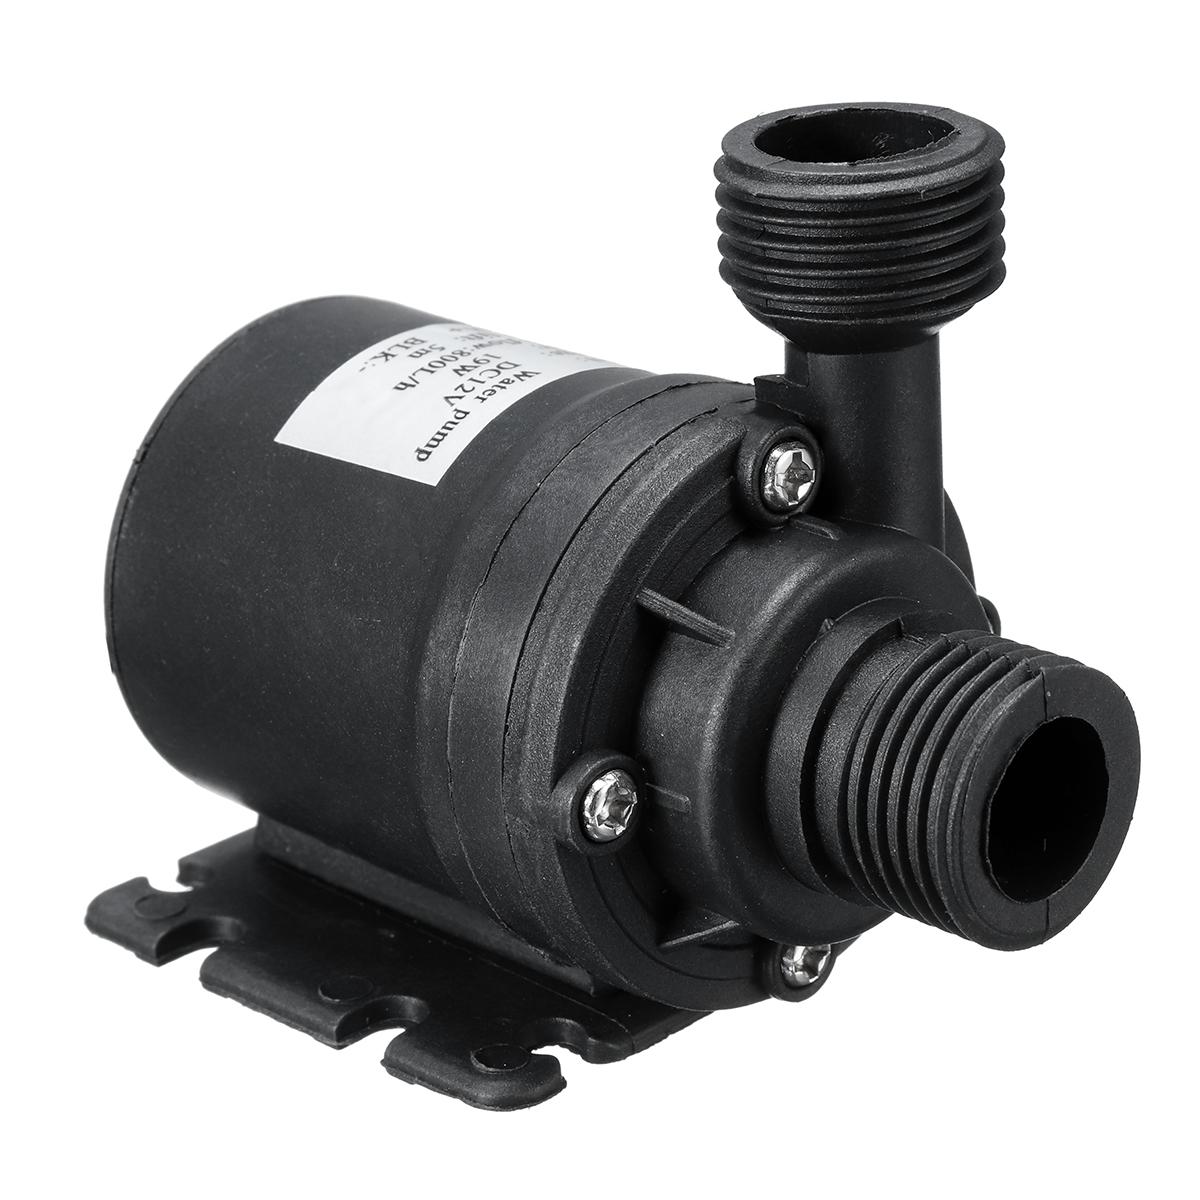 DC 12V/24V 800L/H Submersible Water Pump 5M Solar Brushless Motor Water Circulation Pump